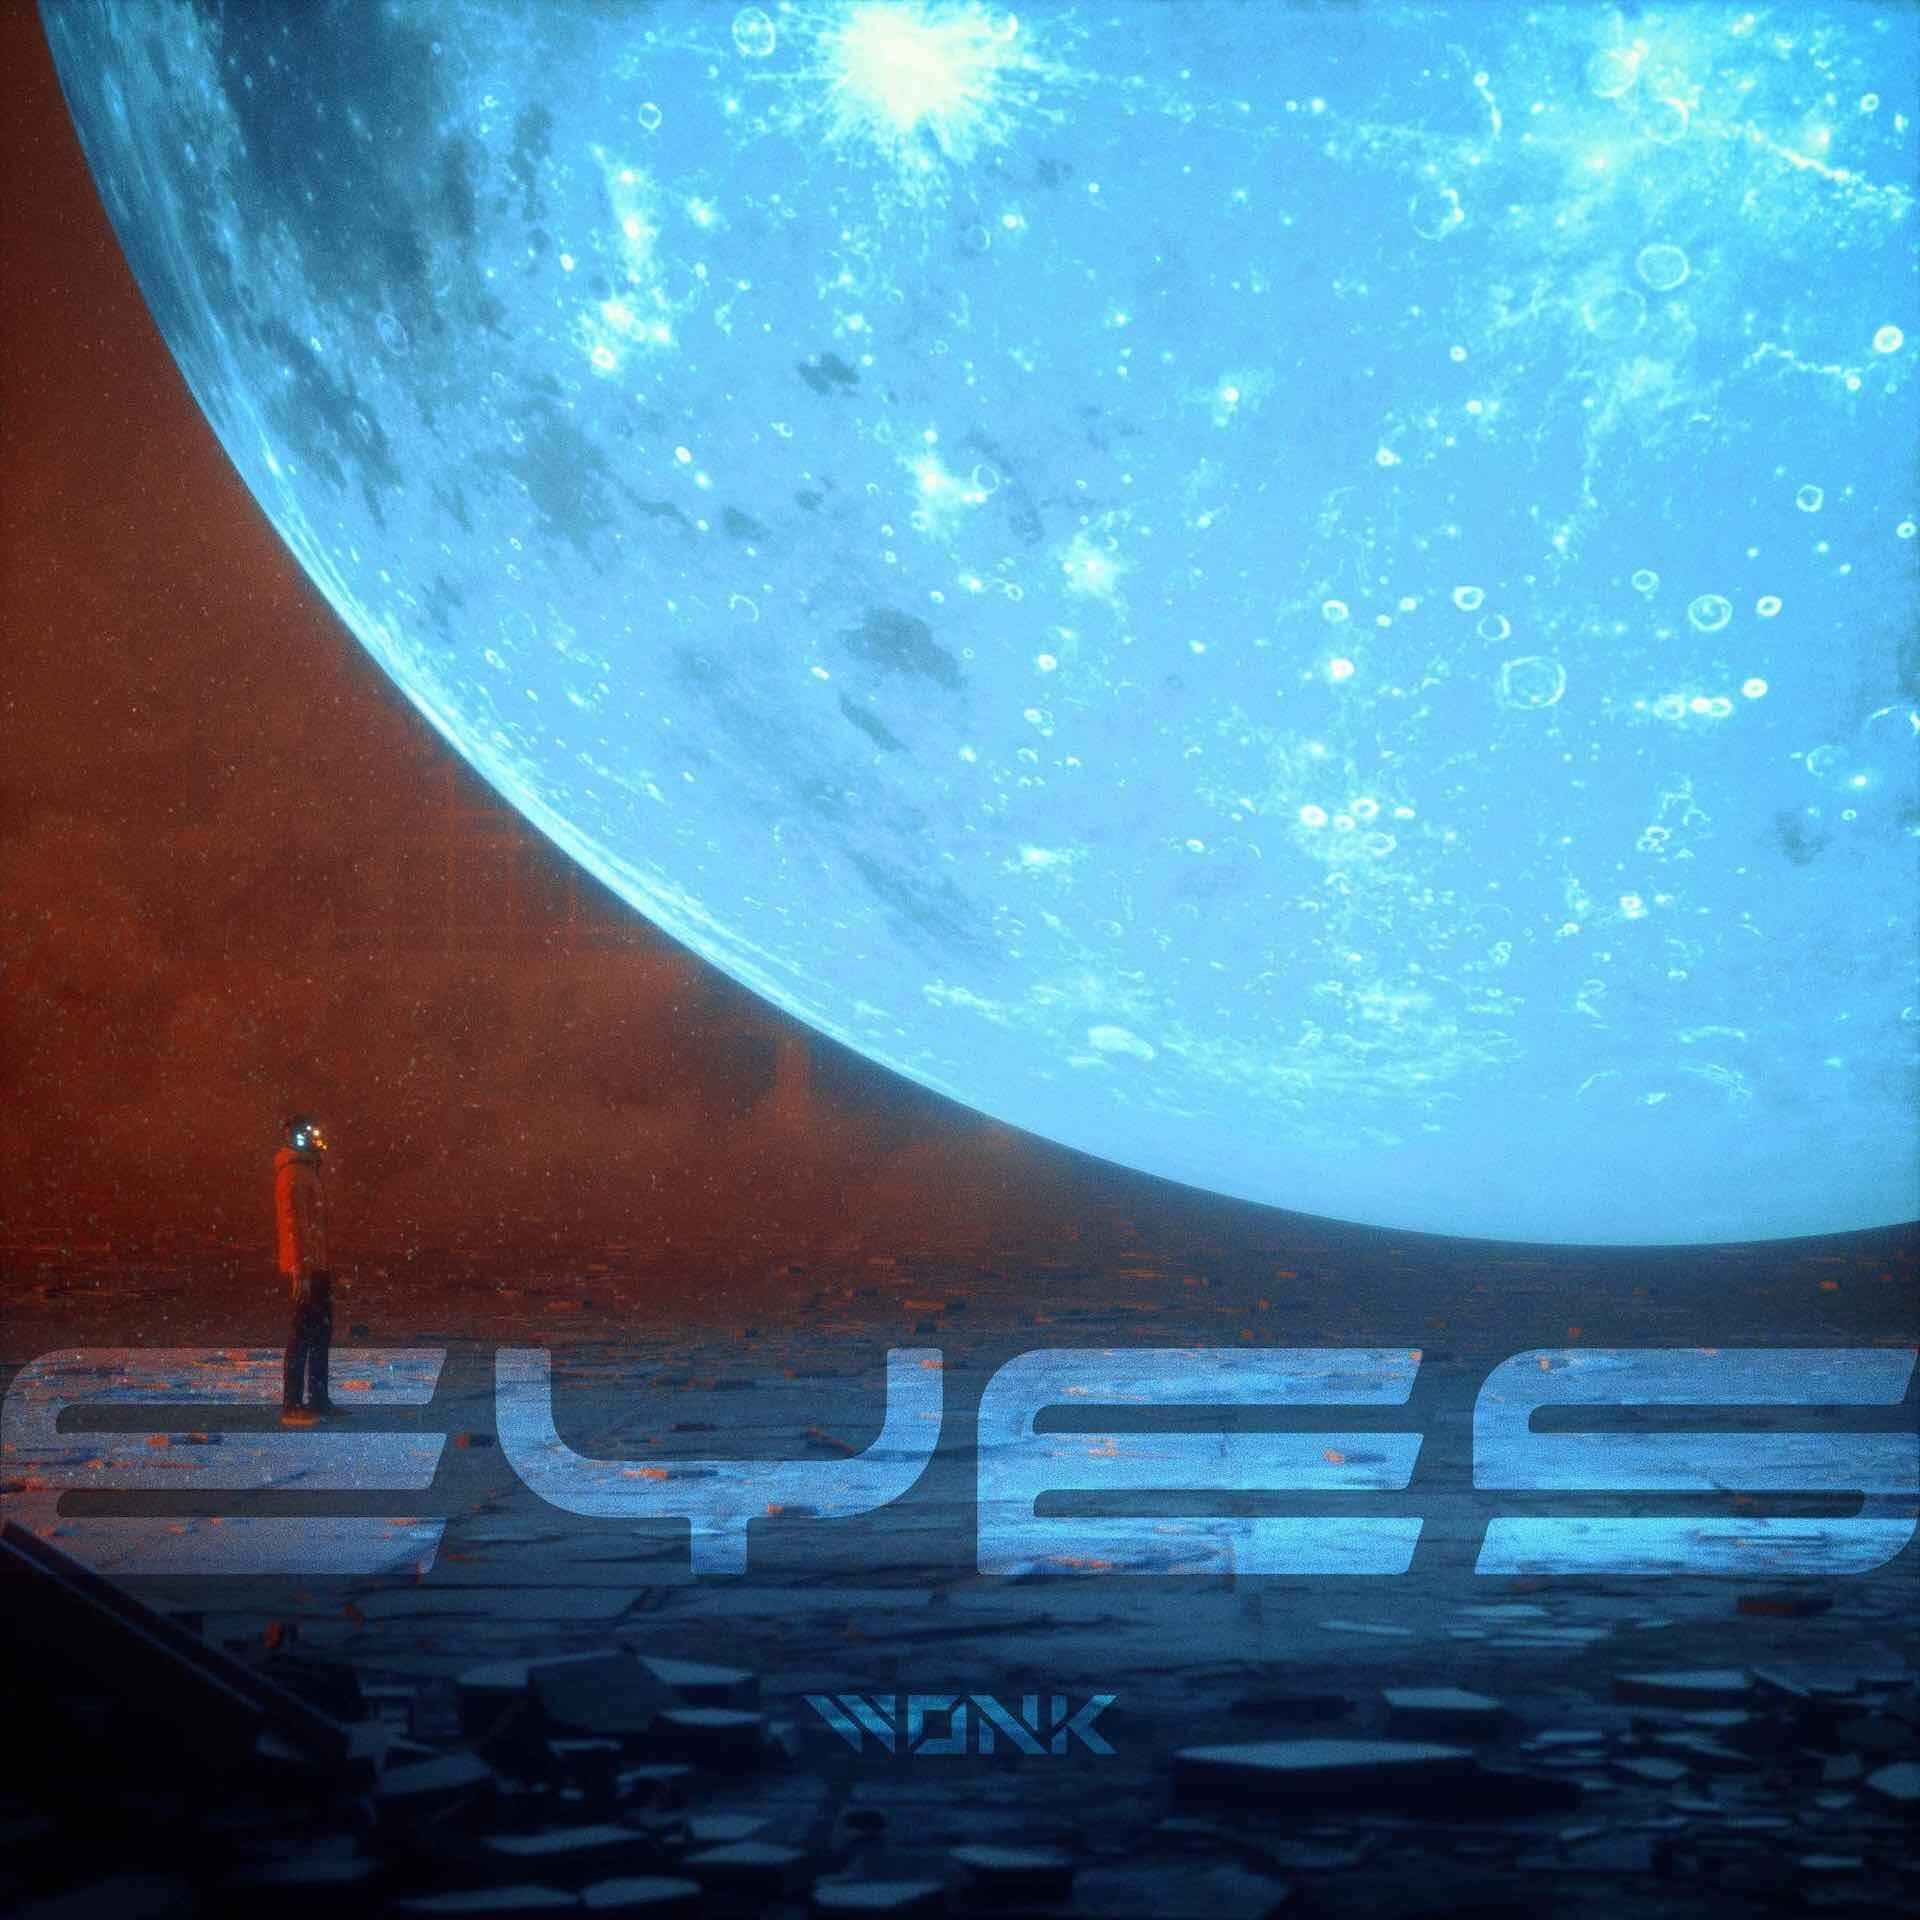 WONK『EYES』のリミックスシリーズが配信決定!坂東祐大、Oscar Jerome、Charlie Limが参加 music210609_wonk_remix_3